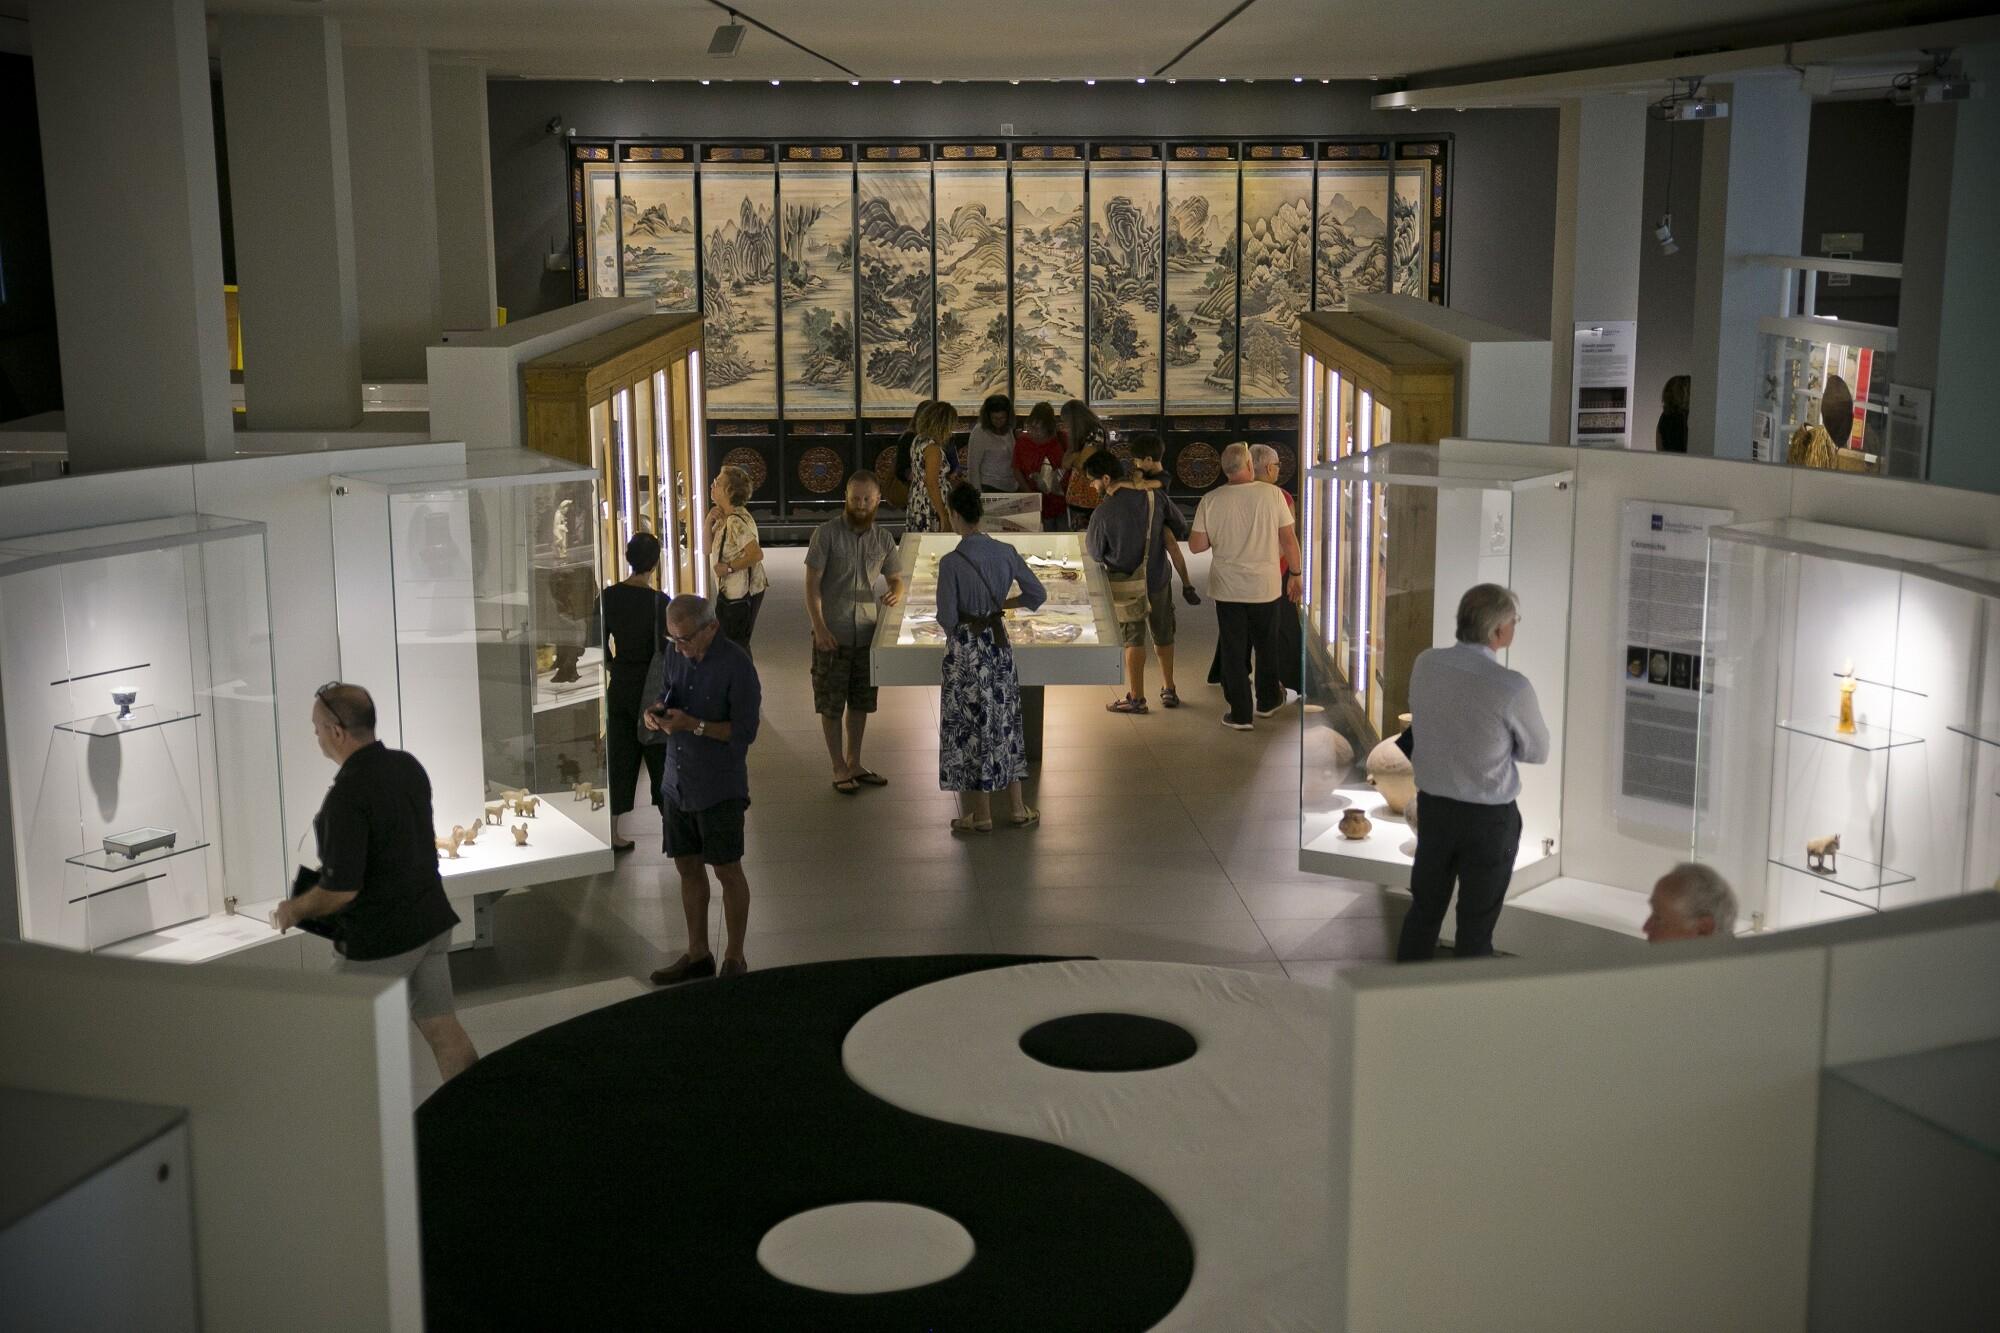 Al Museo d'Arte Cinese tra moda e sfilata di maschere